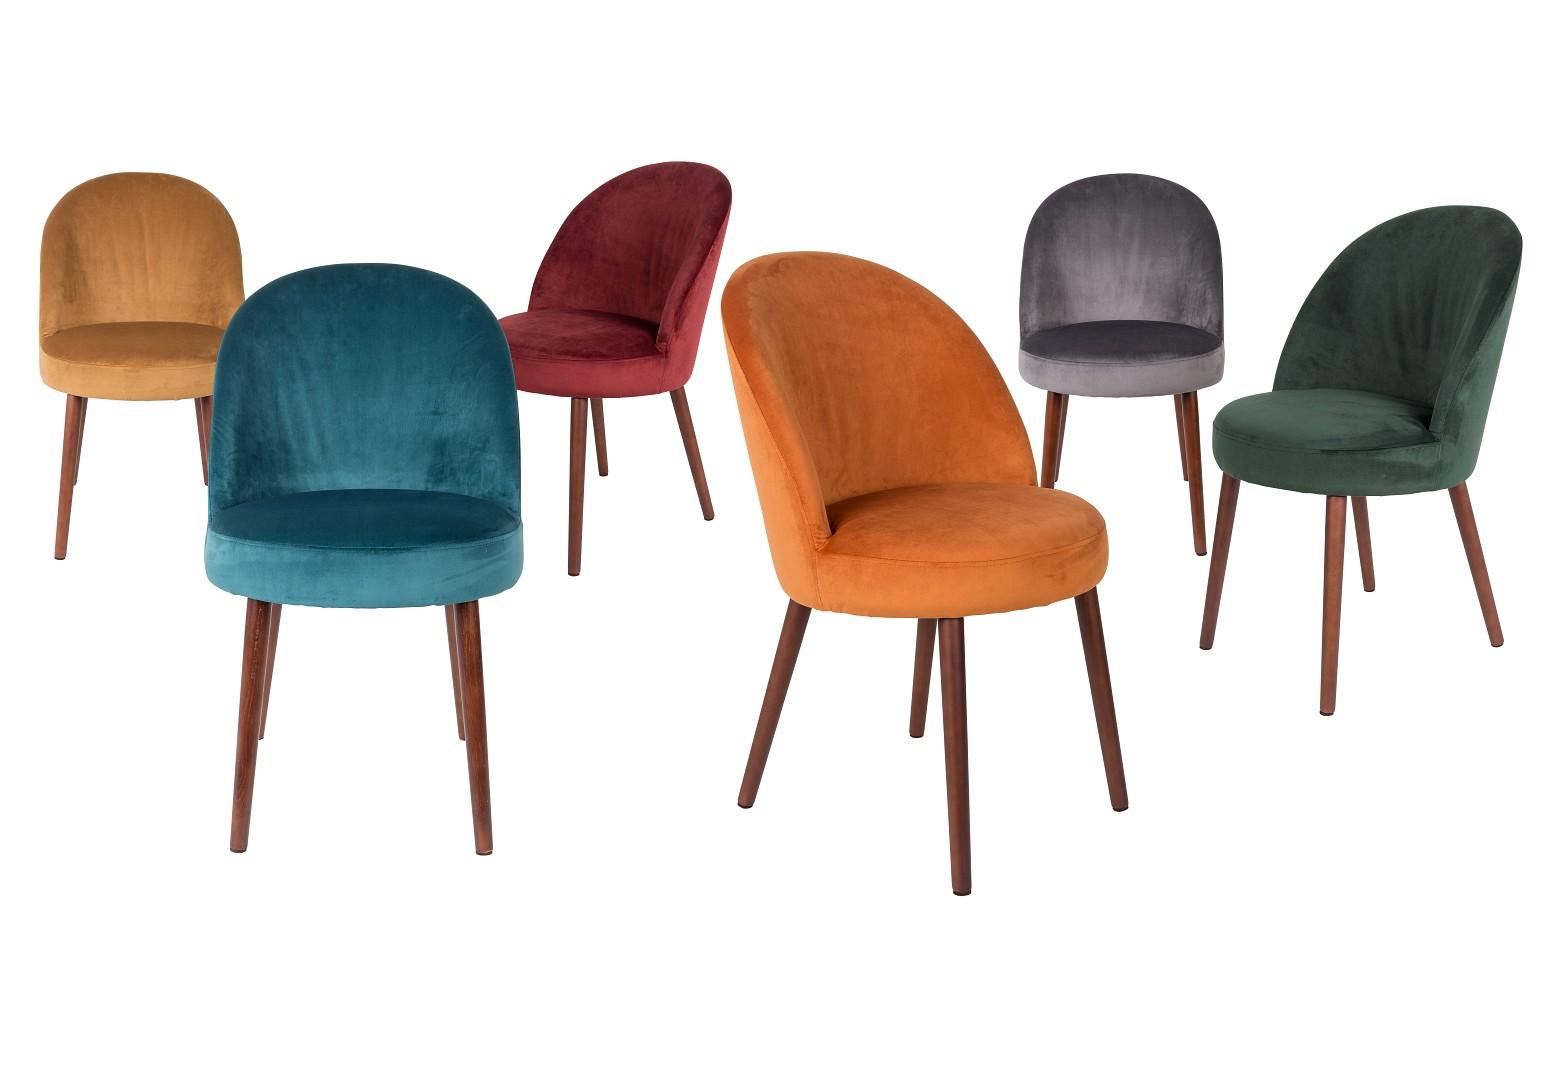 Zuiver stuhl latest trendy zuiver stuhl omg erset schwarz zuiver